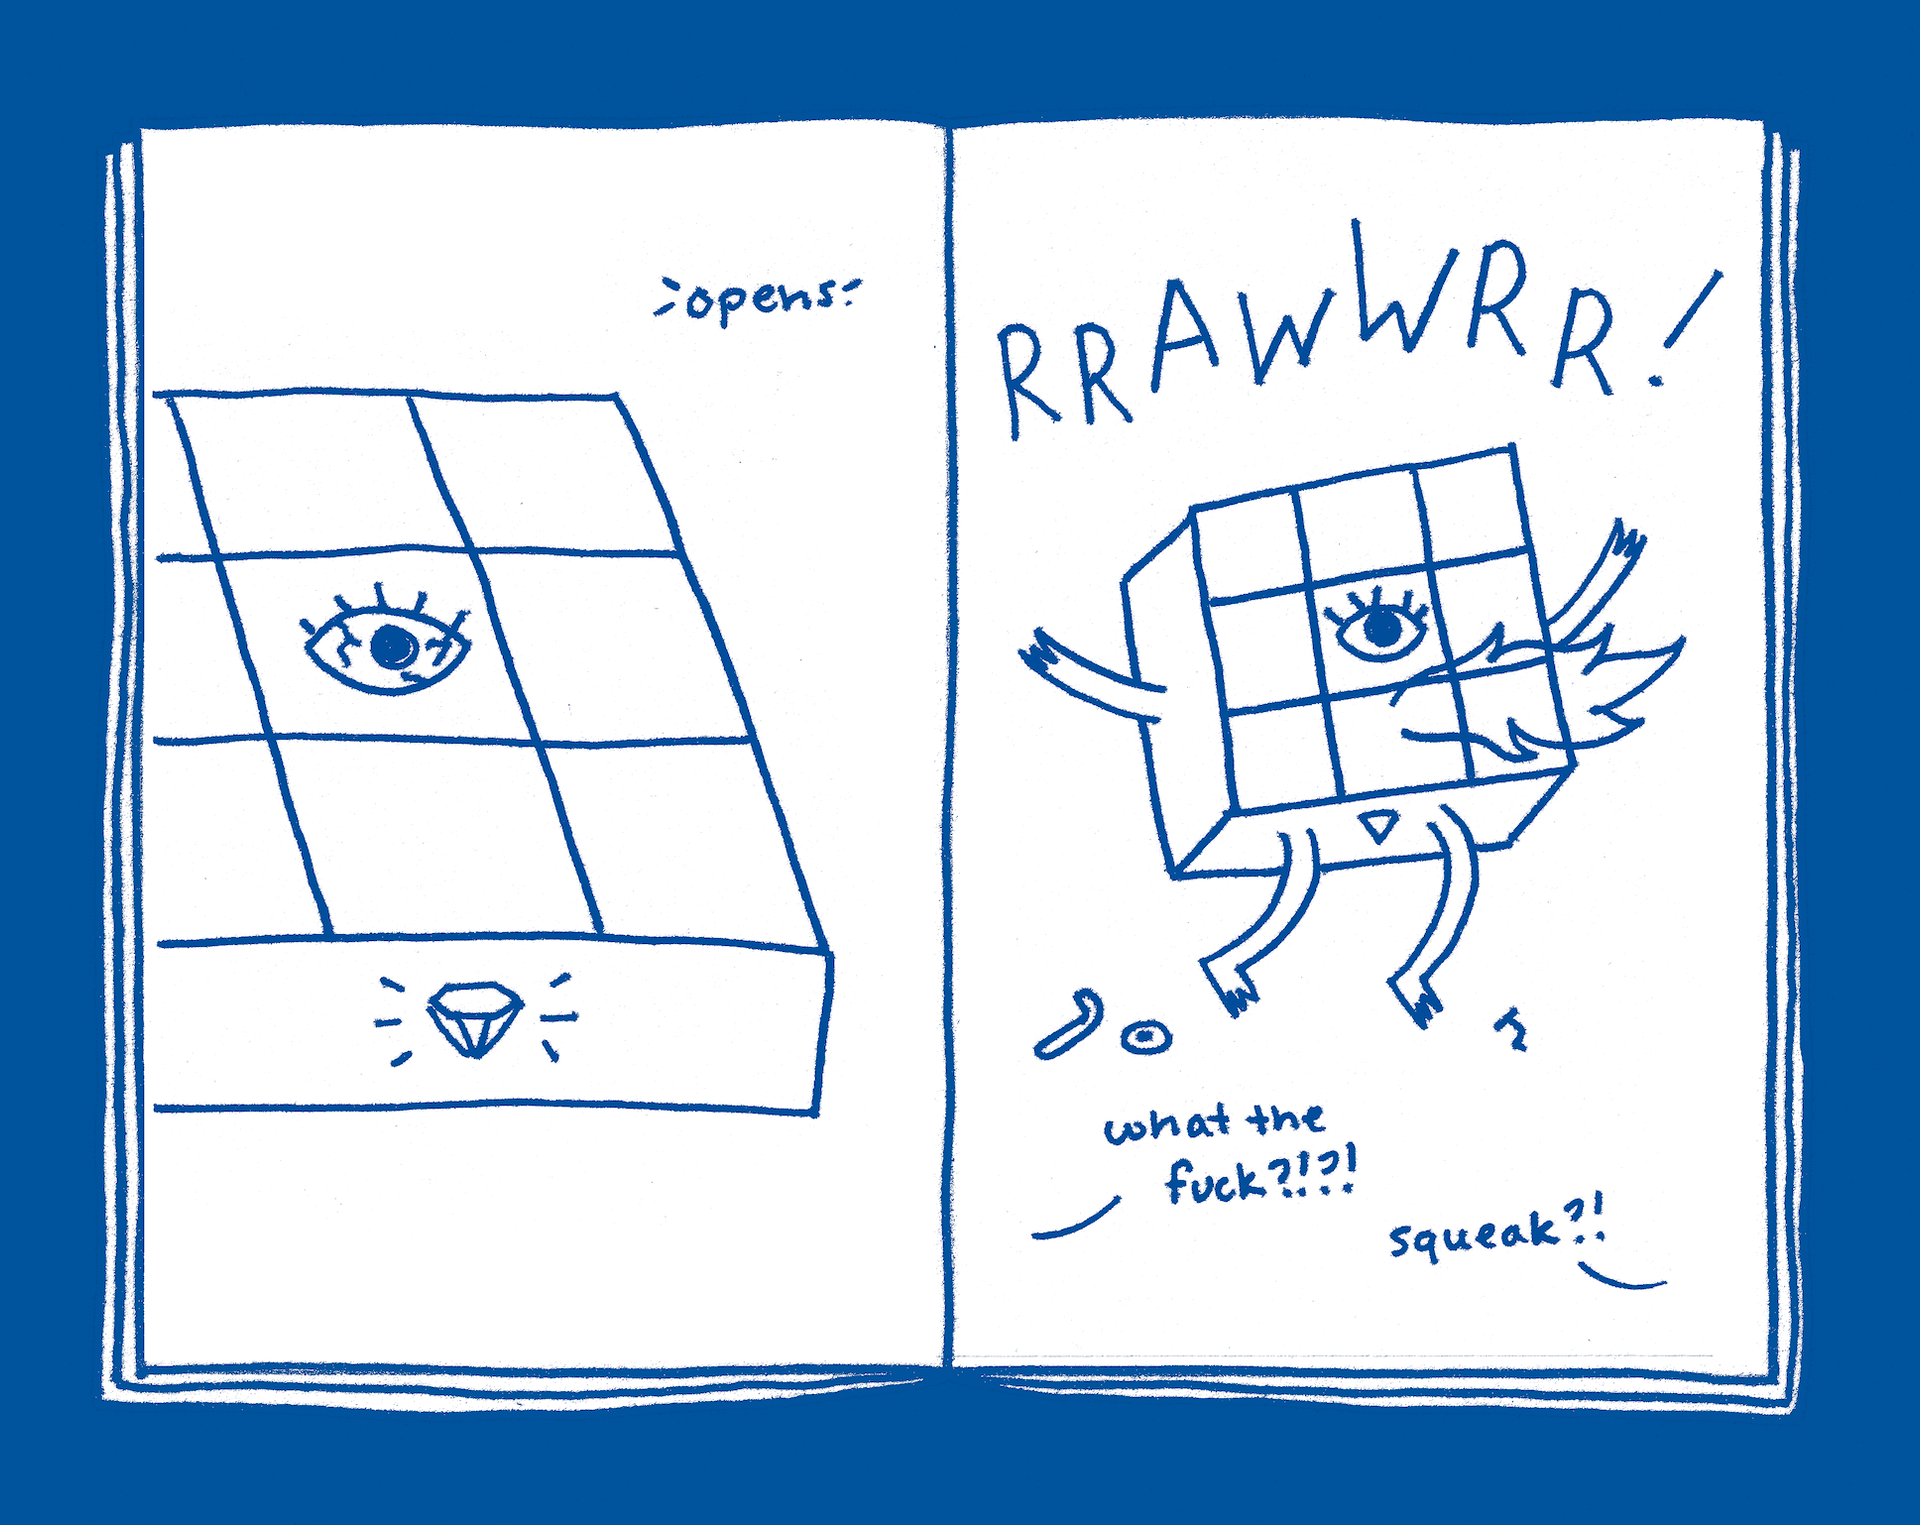 IKEA_drawnpages_600dpi_9-10.png